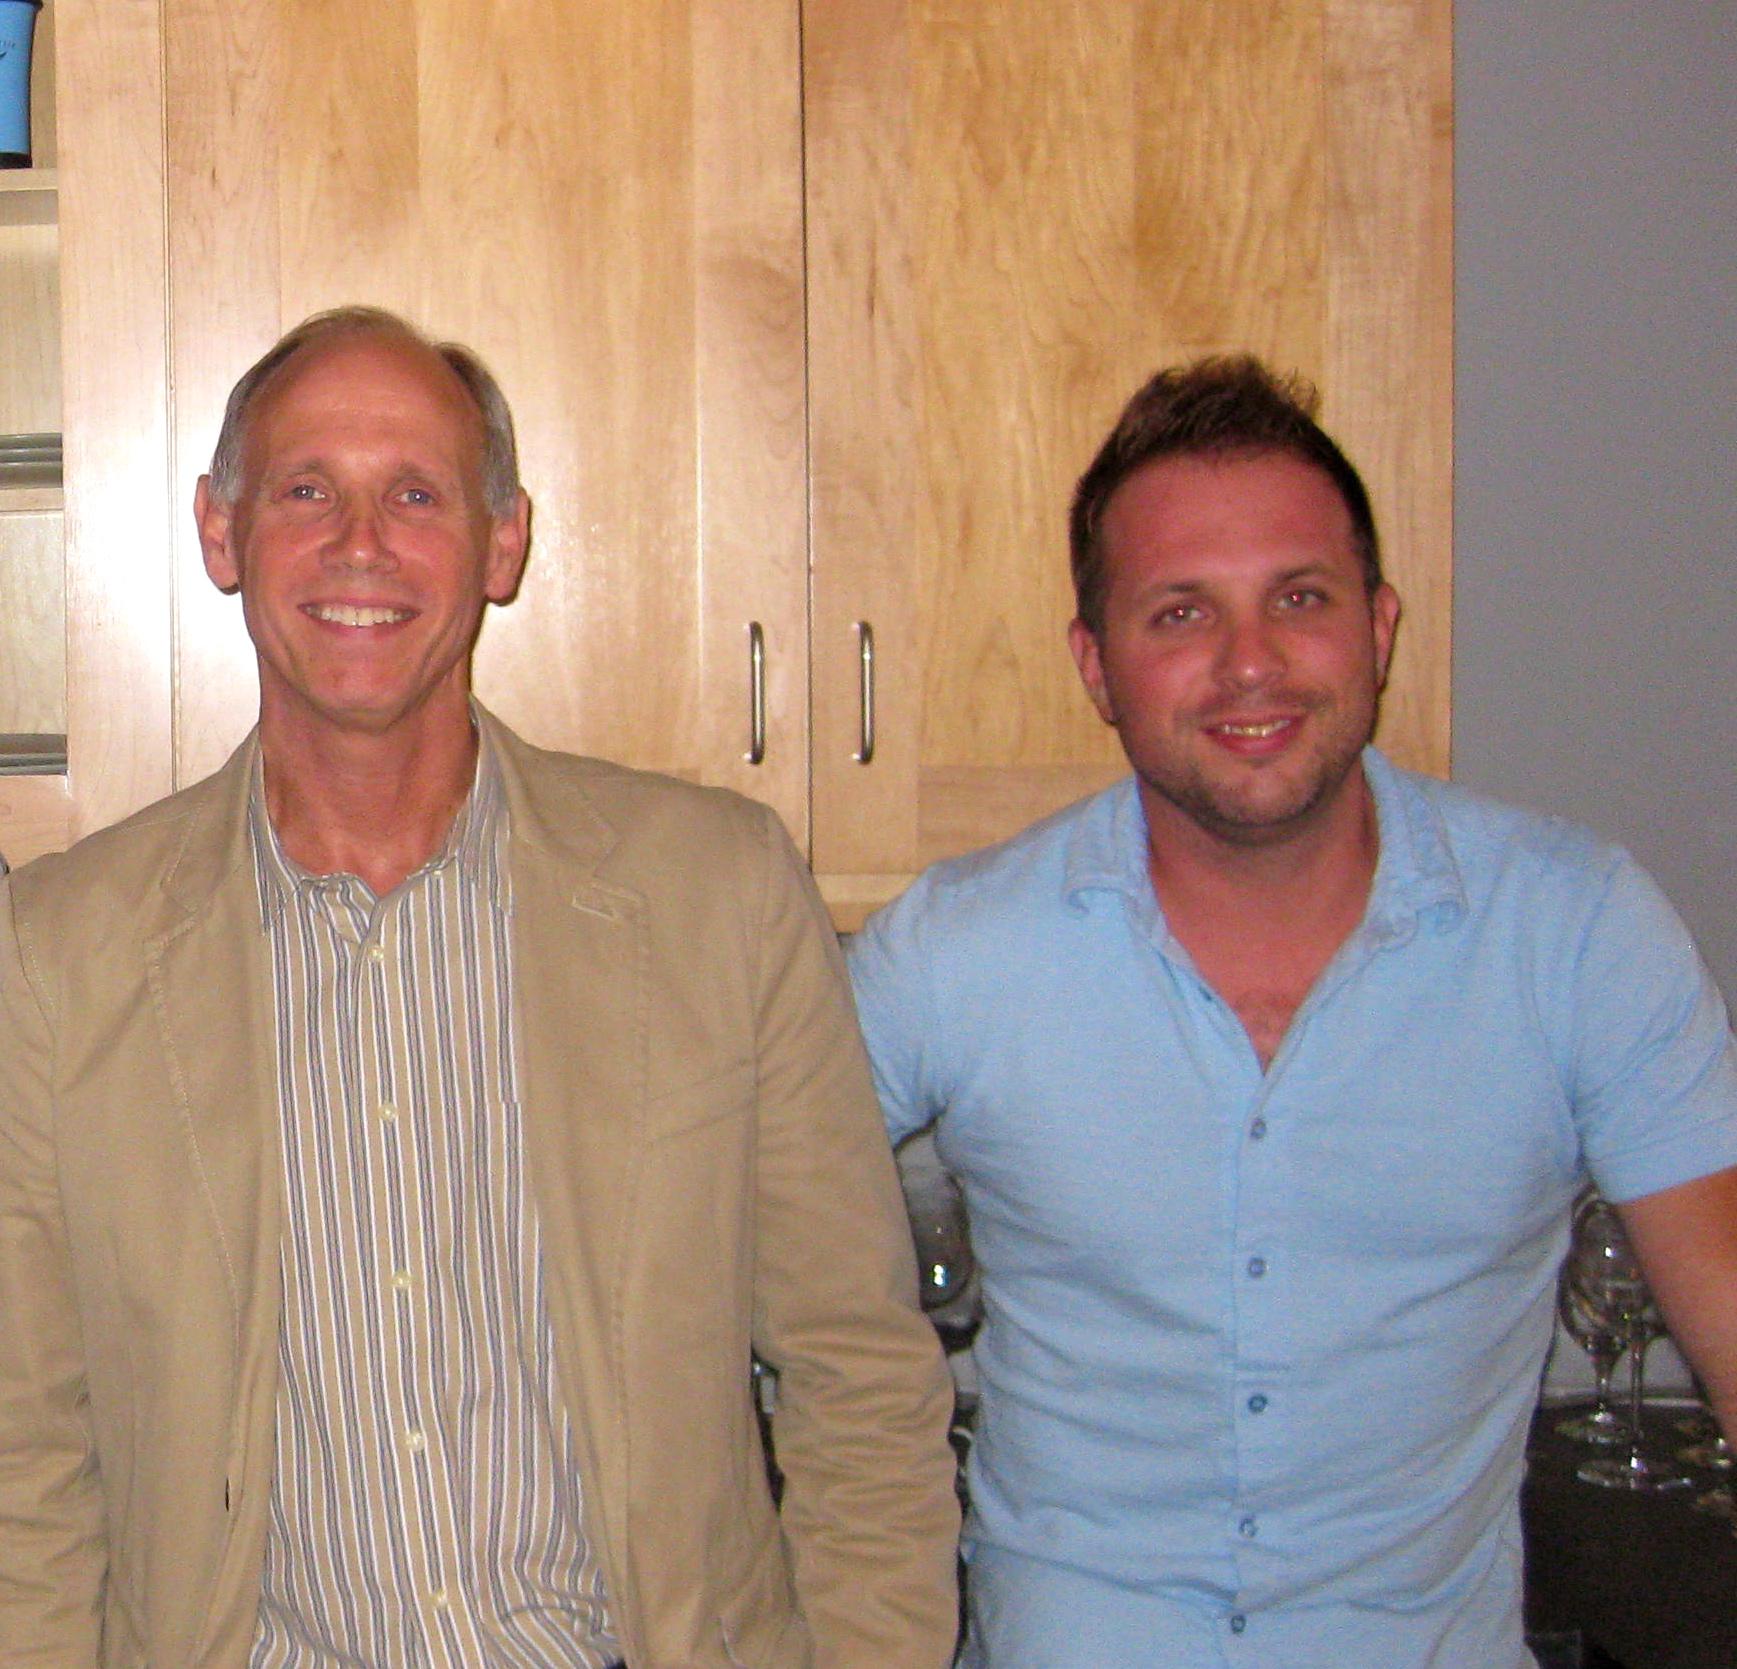 Aaron Parkinson and Bob Clarke